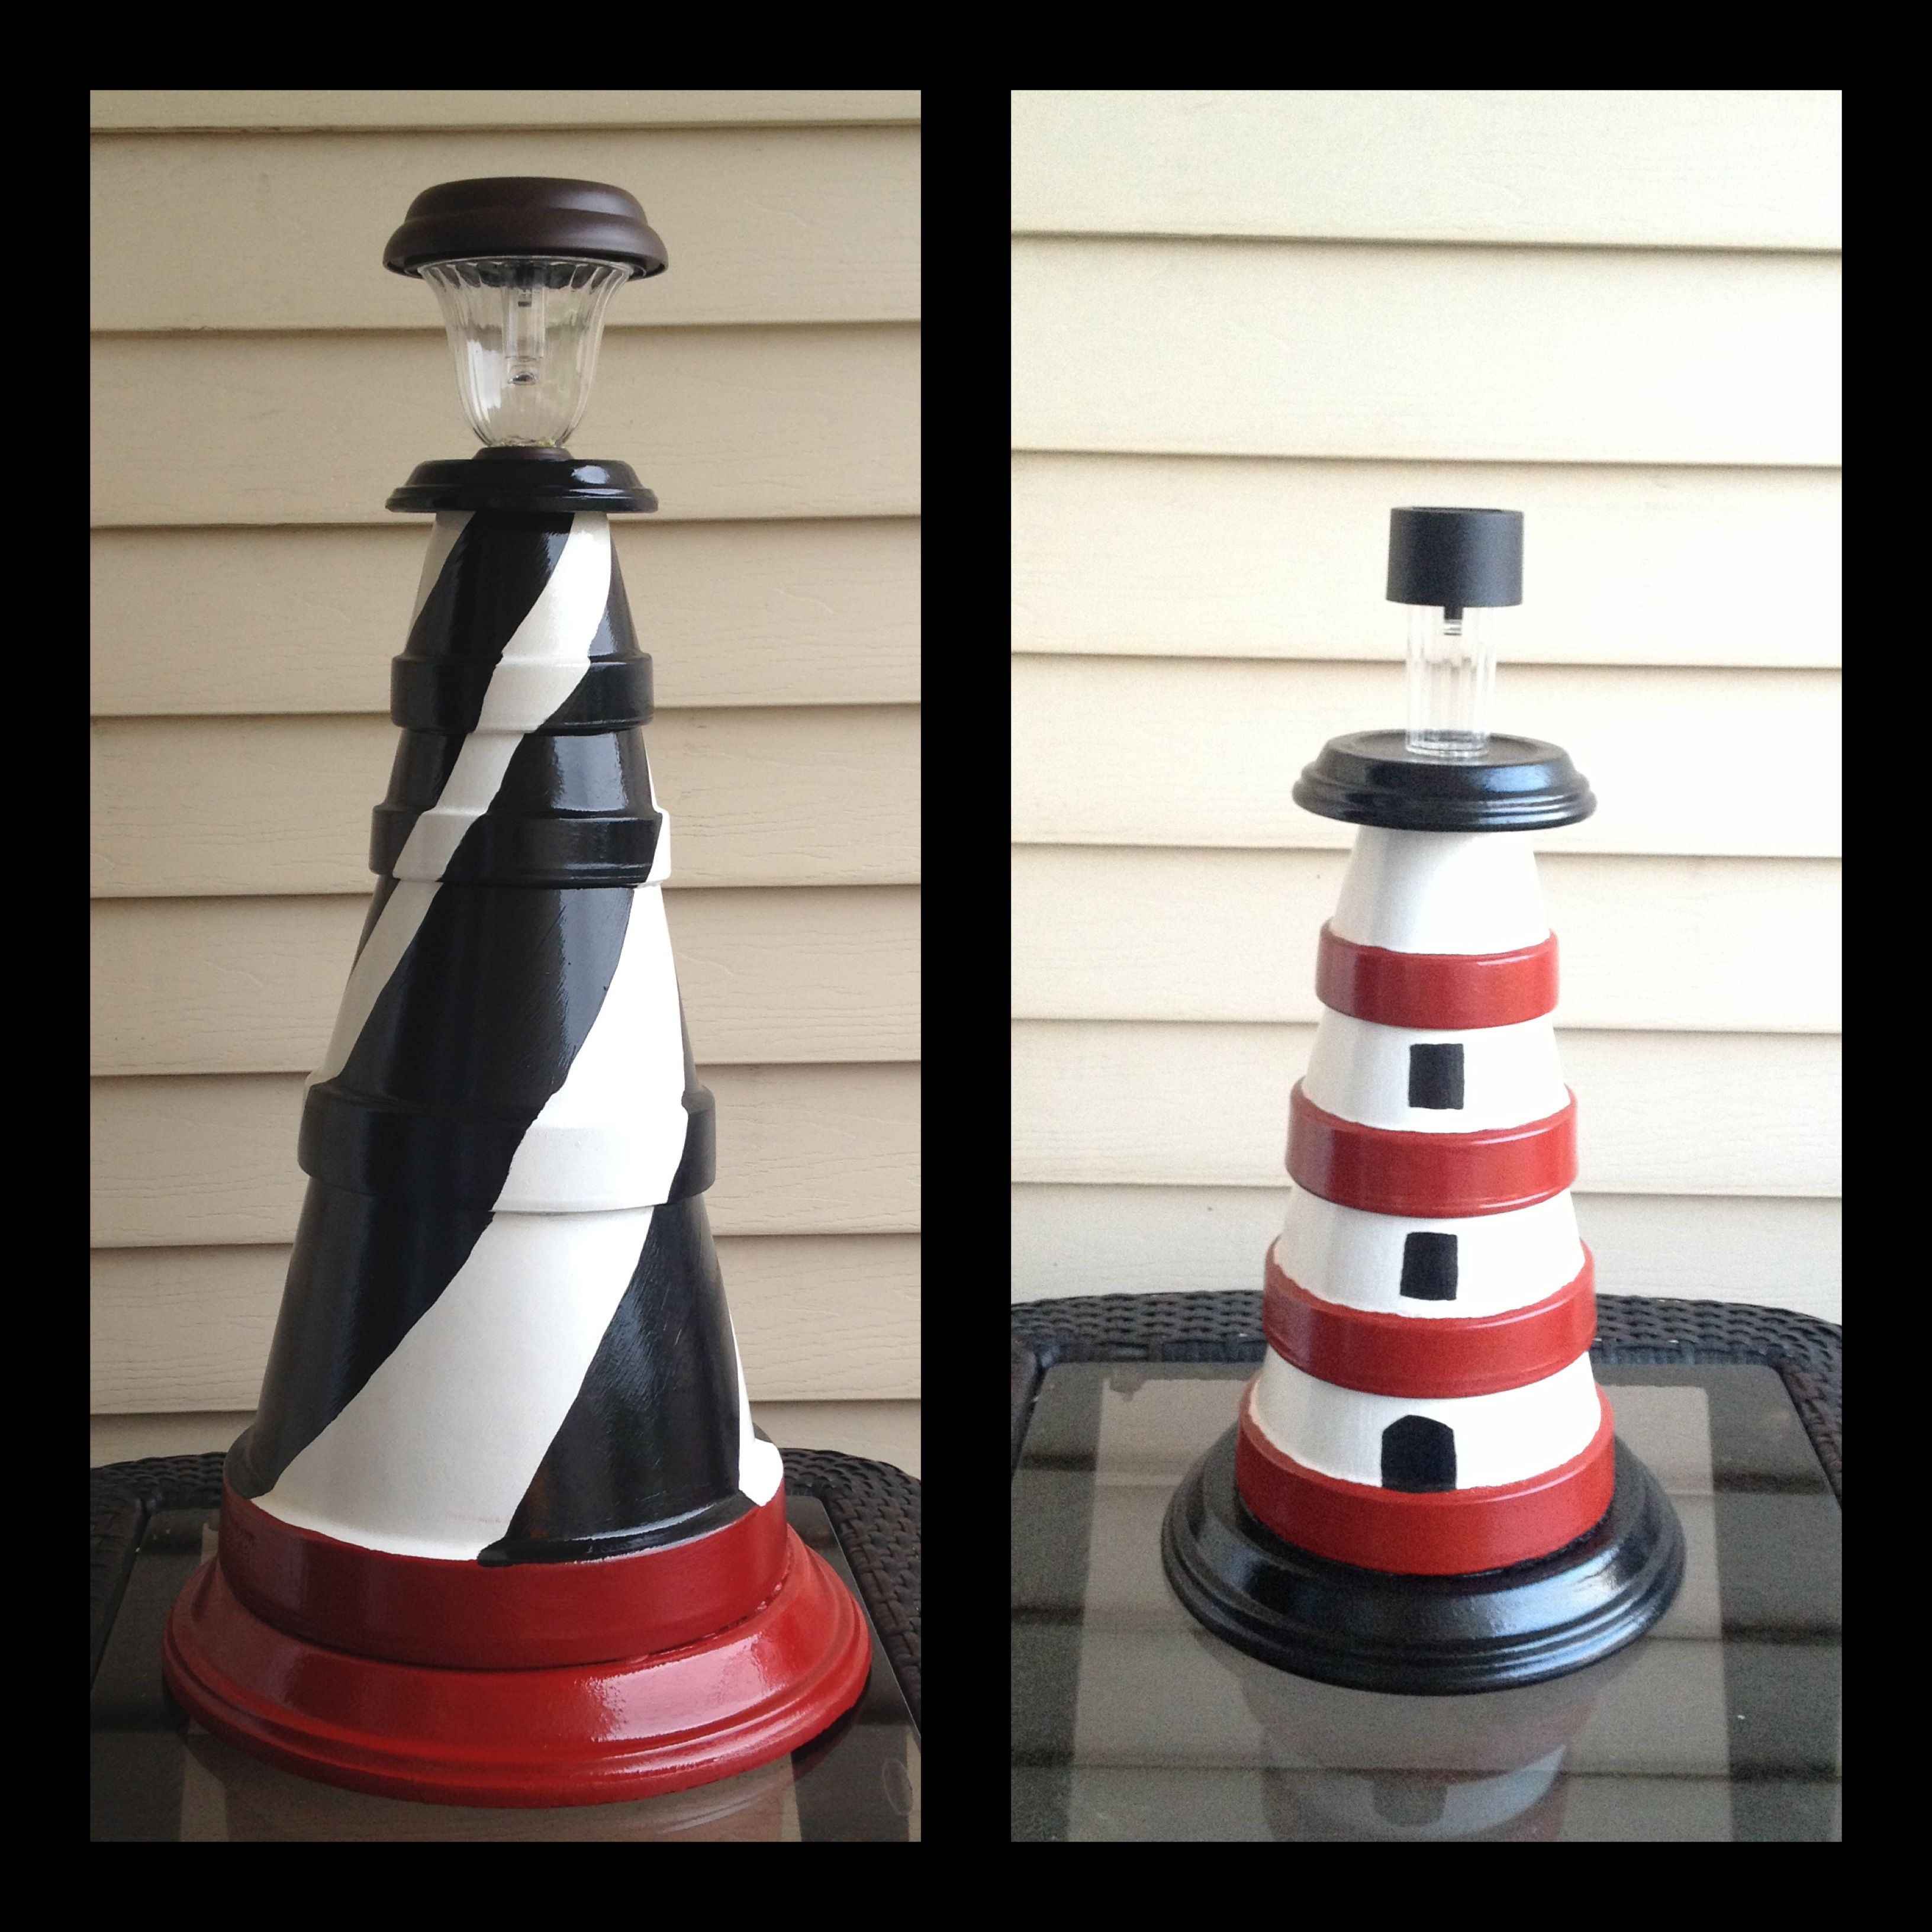 Diy make a clay pot lighthouse diy craft projects - Clay Pot Lighthouses